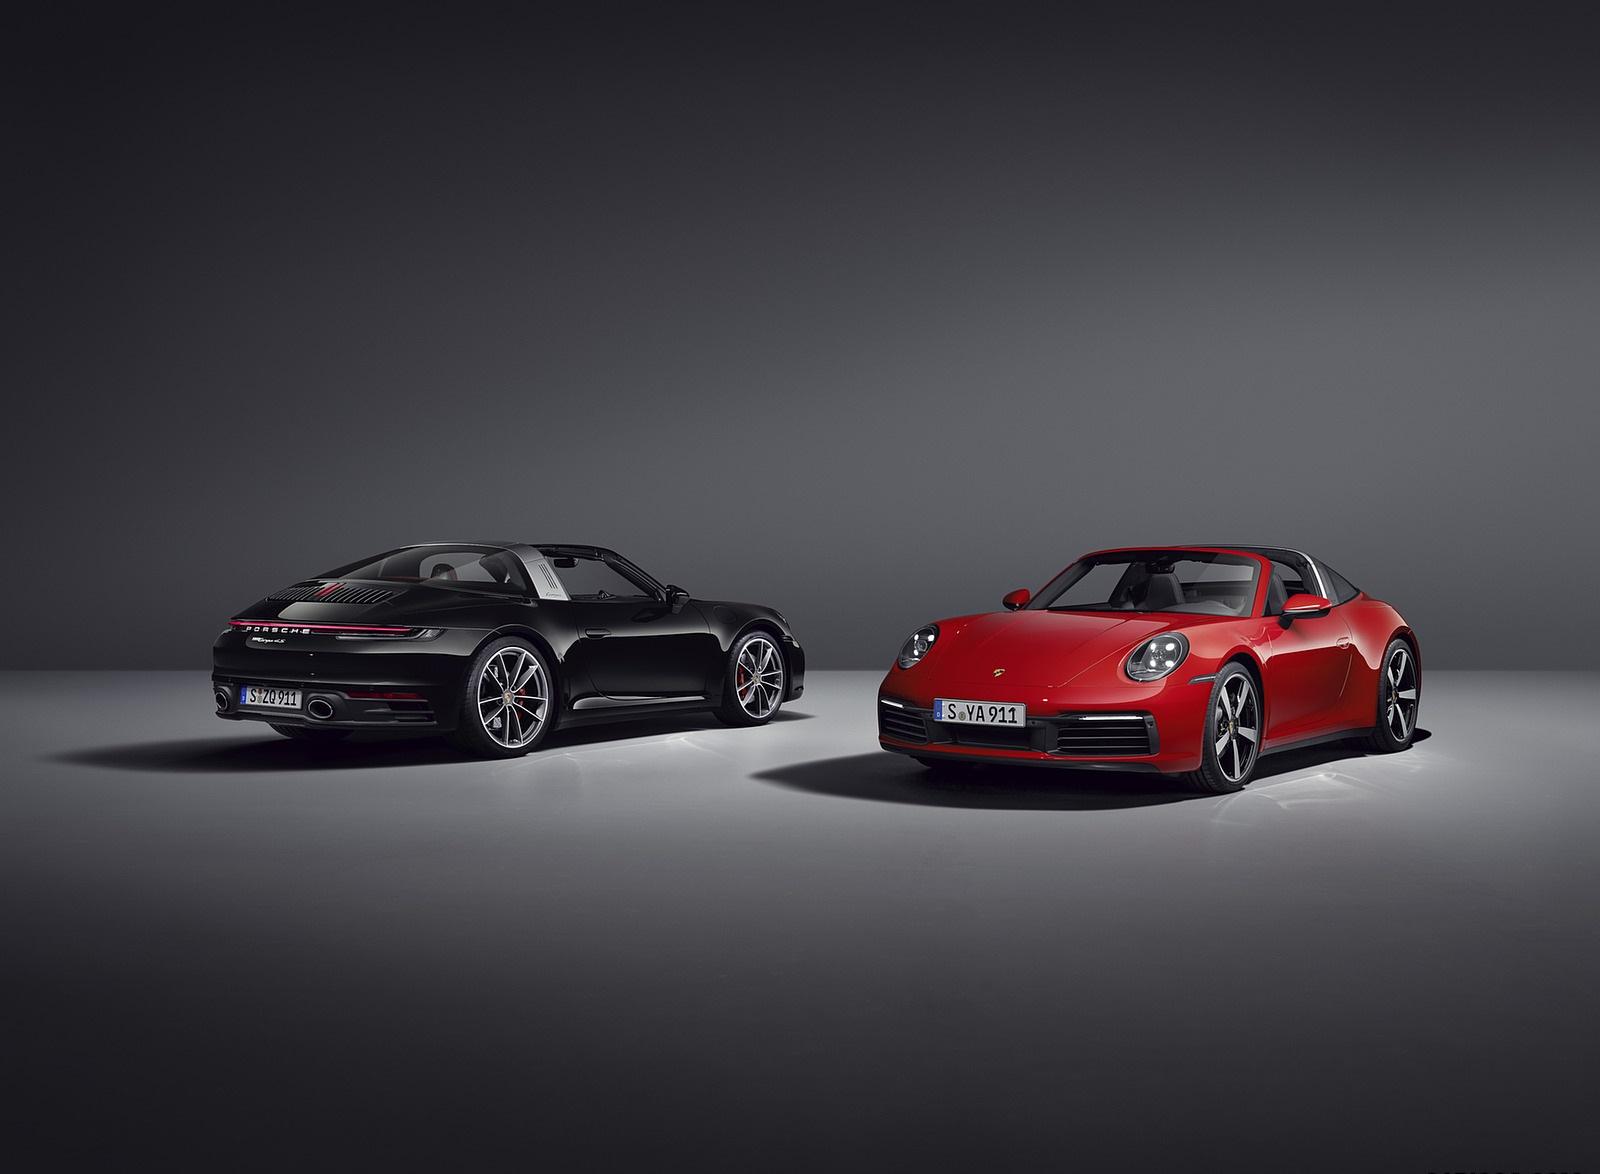 2021 Porsche 911 Targa 4S and Targa 4 Wallpapers (7)